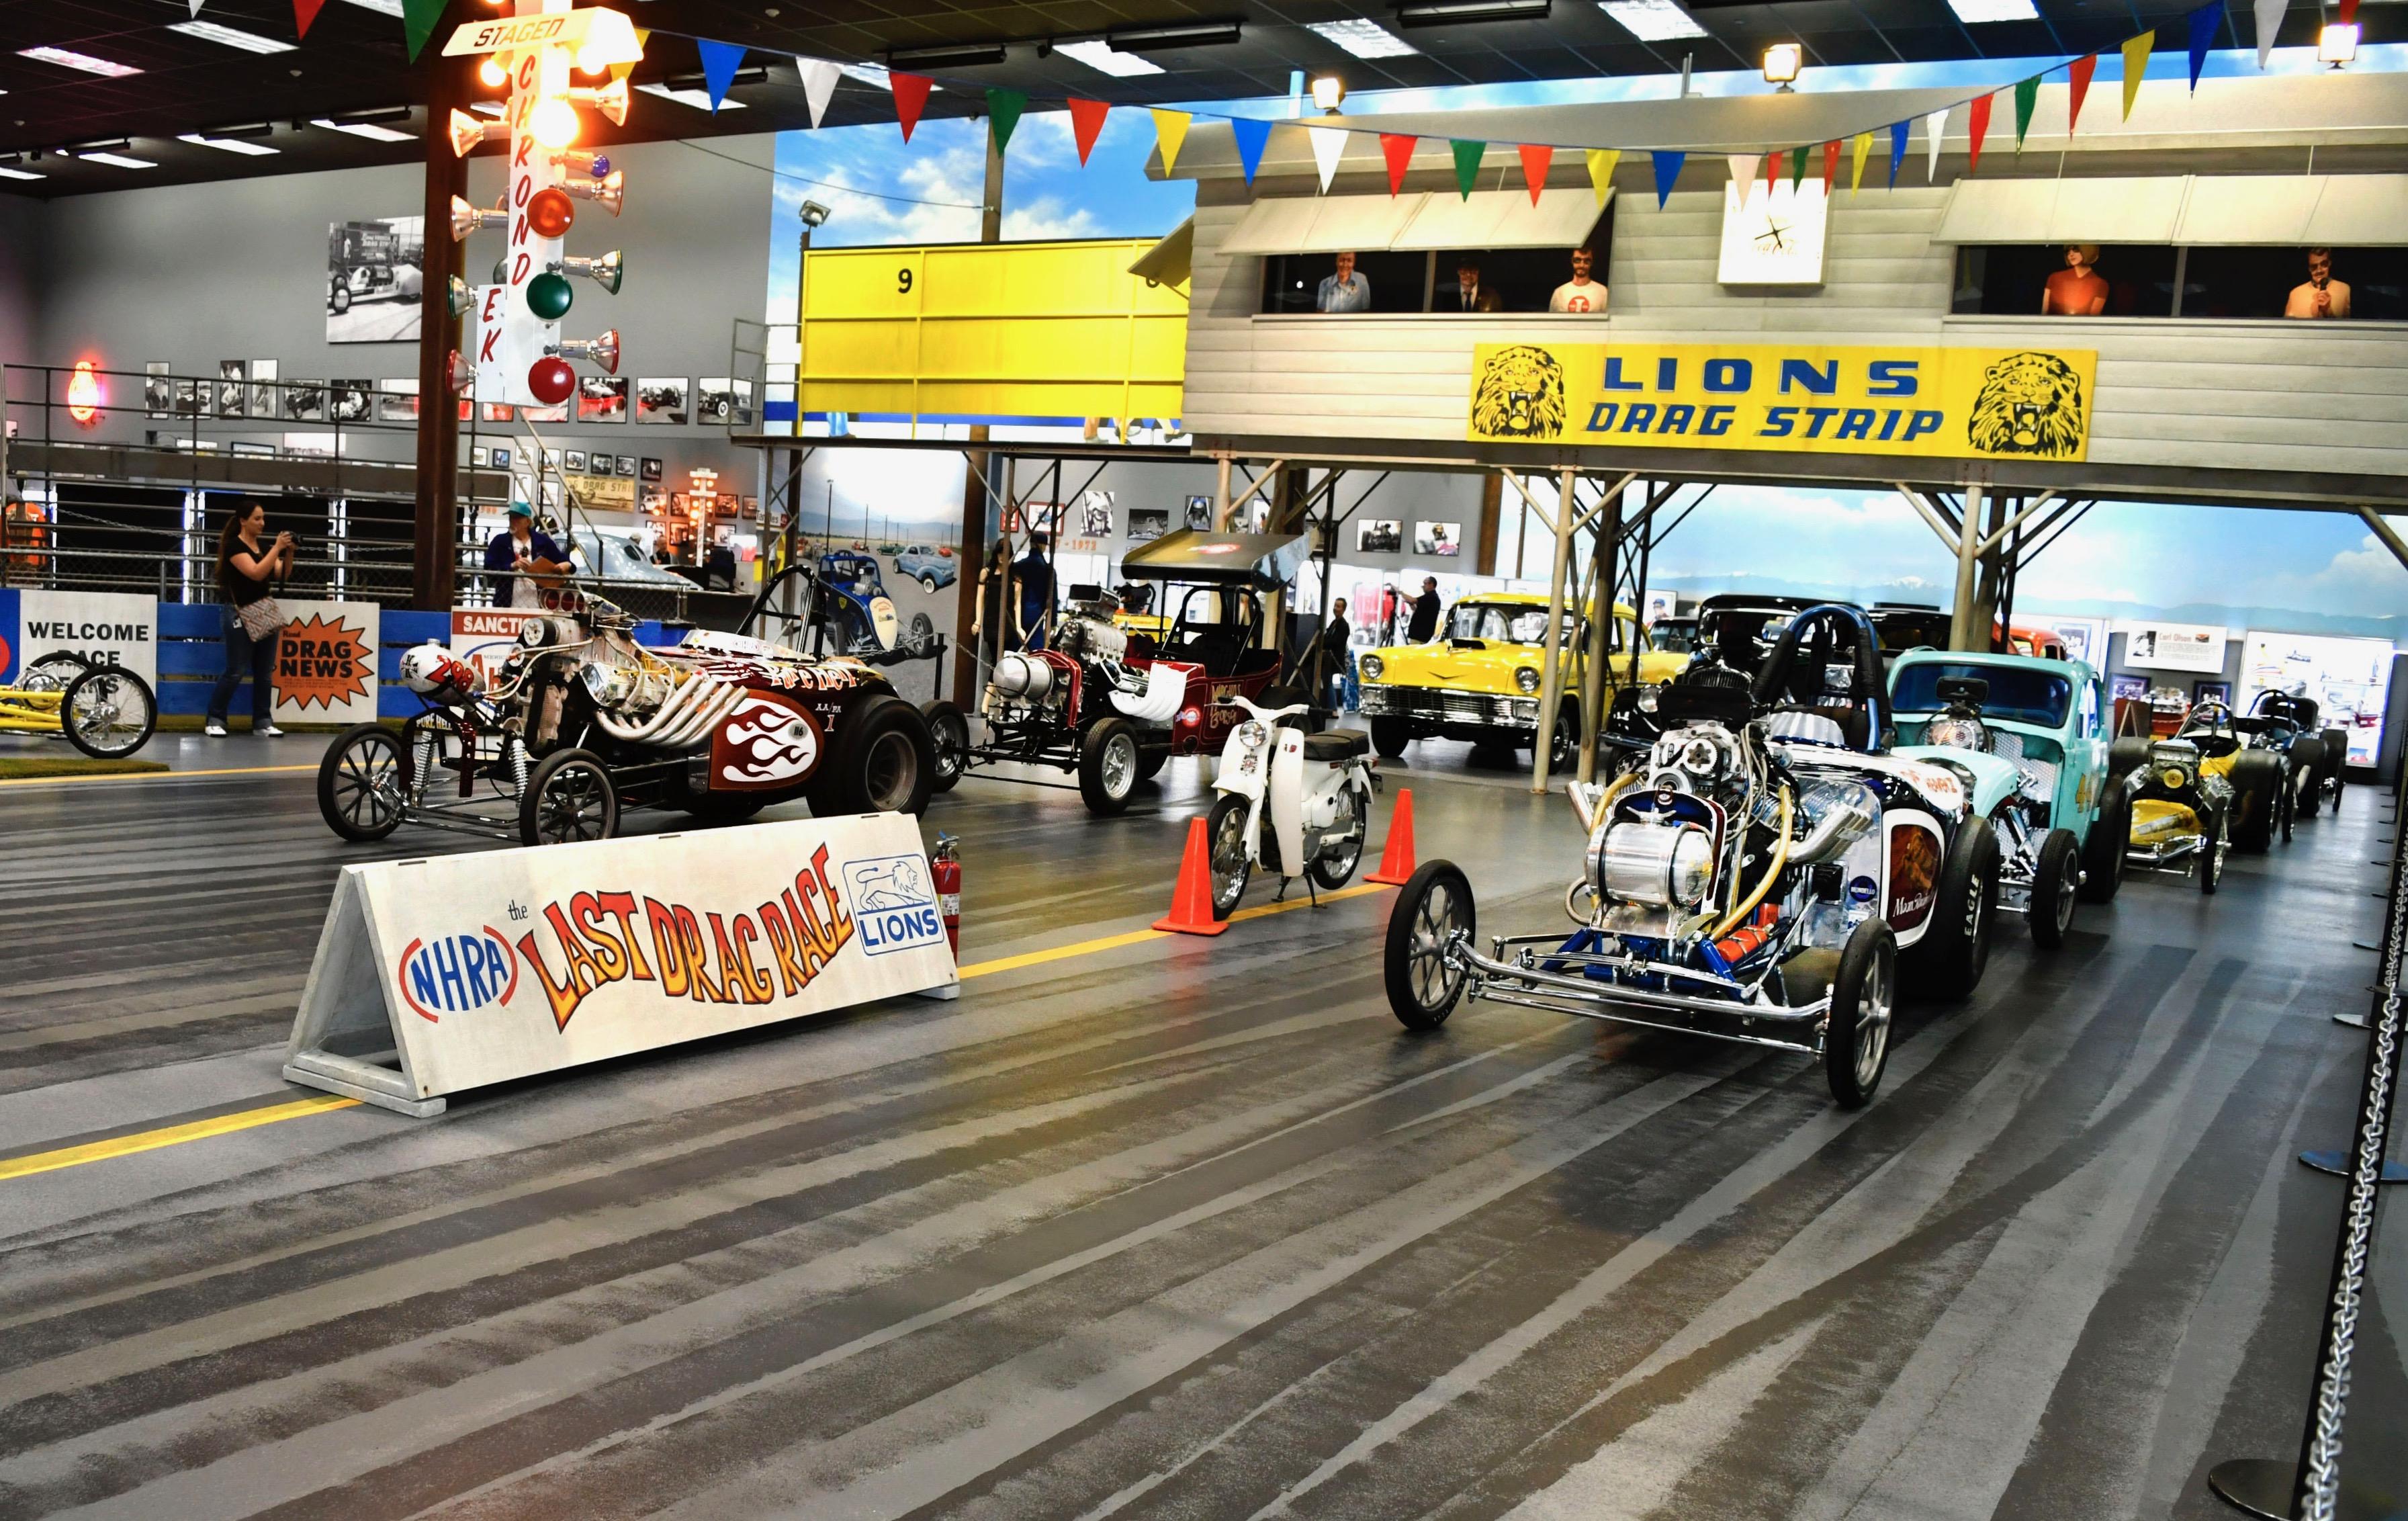 drag strip museum, Lions Drag Strip Museum provides quarter-mile run down Memory Lane, ClassicCars.com Journal